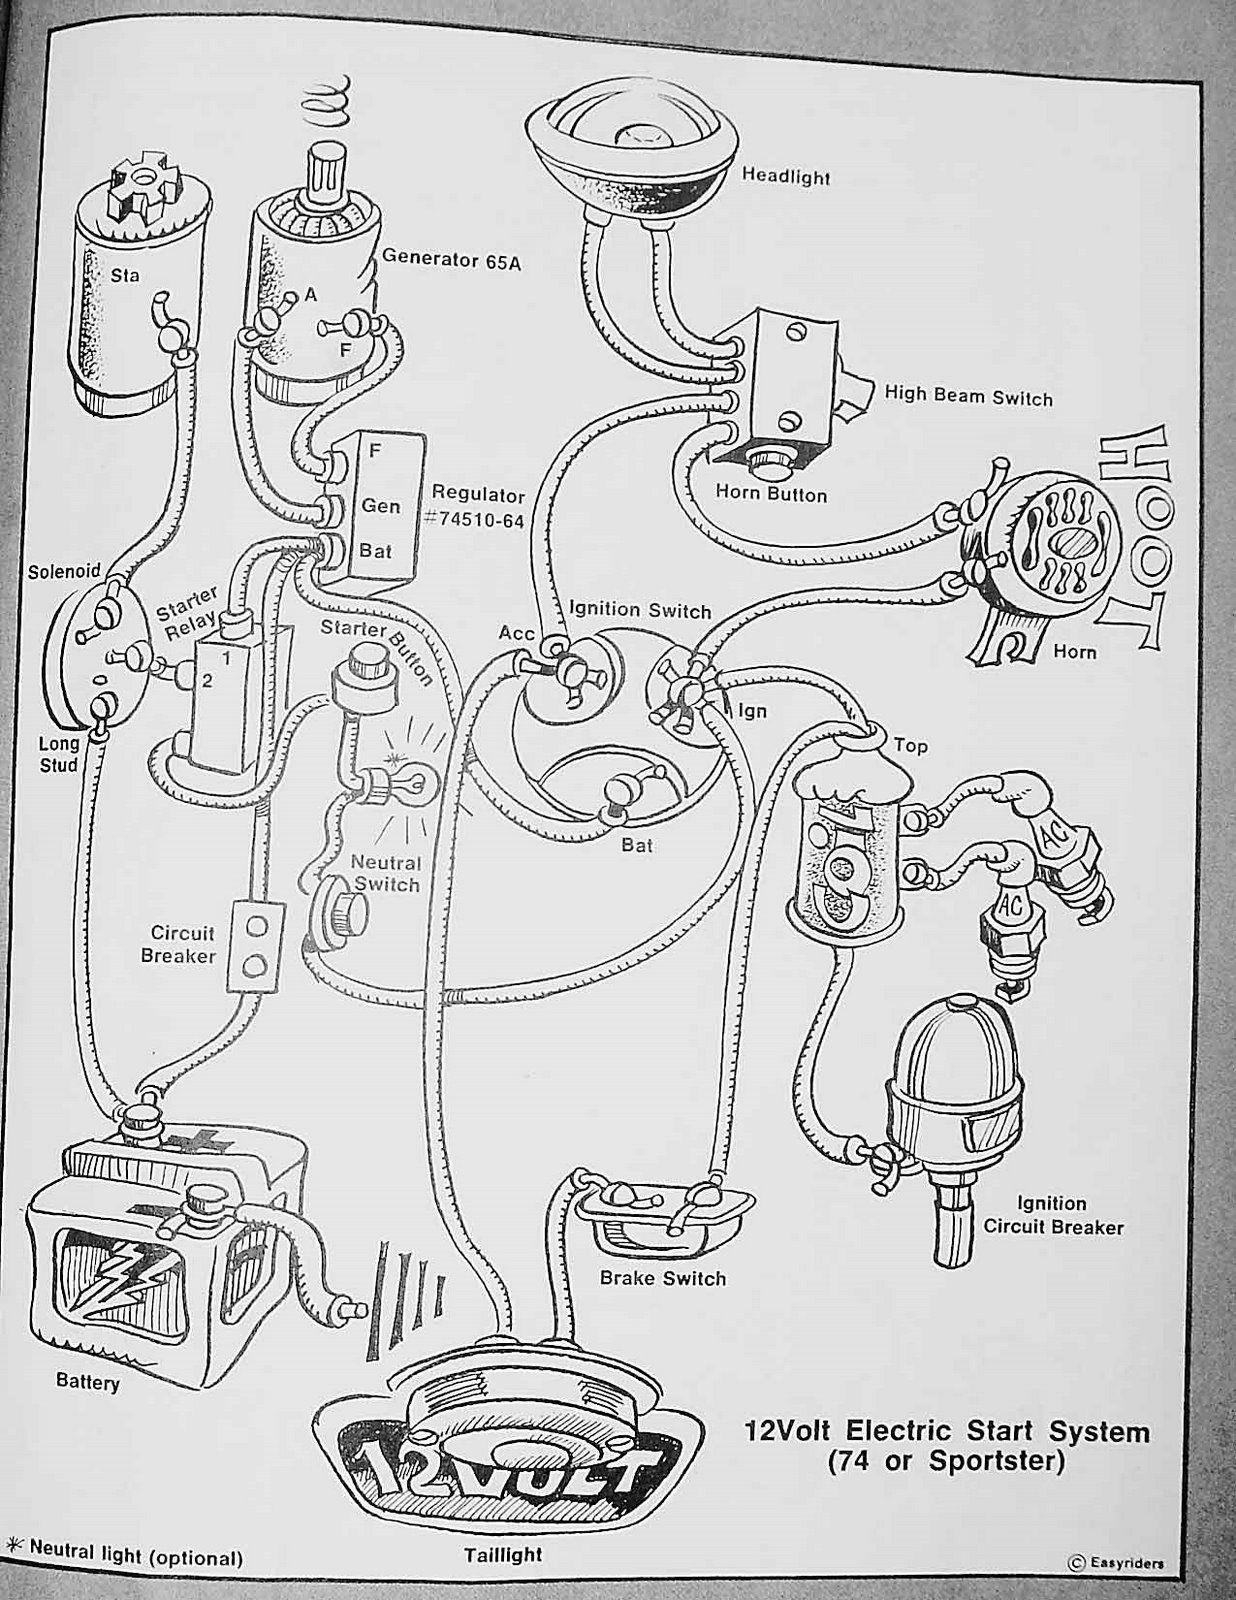 Shovel Head Harley Engine Diagram Pin On Bike Stuff Of Shovel Head Harley Engine Diagram